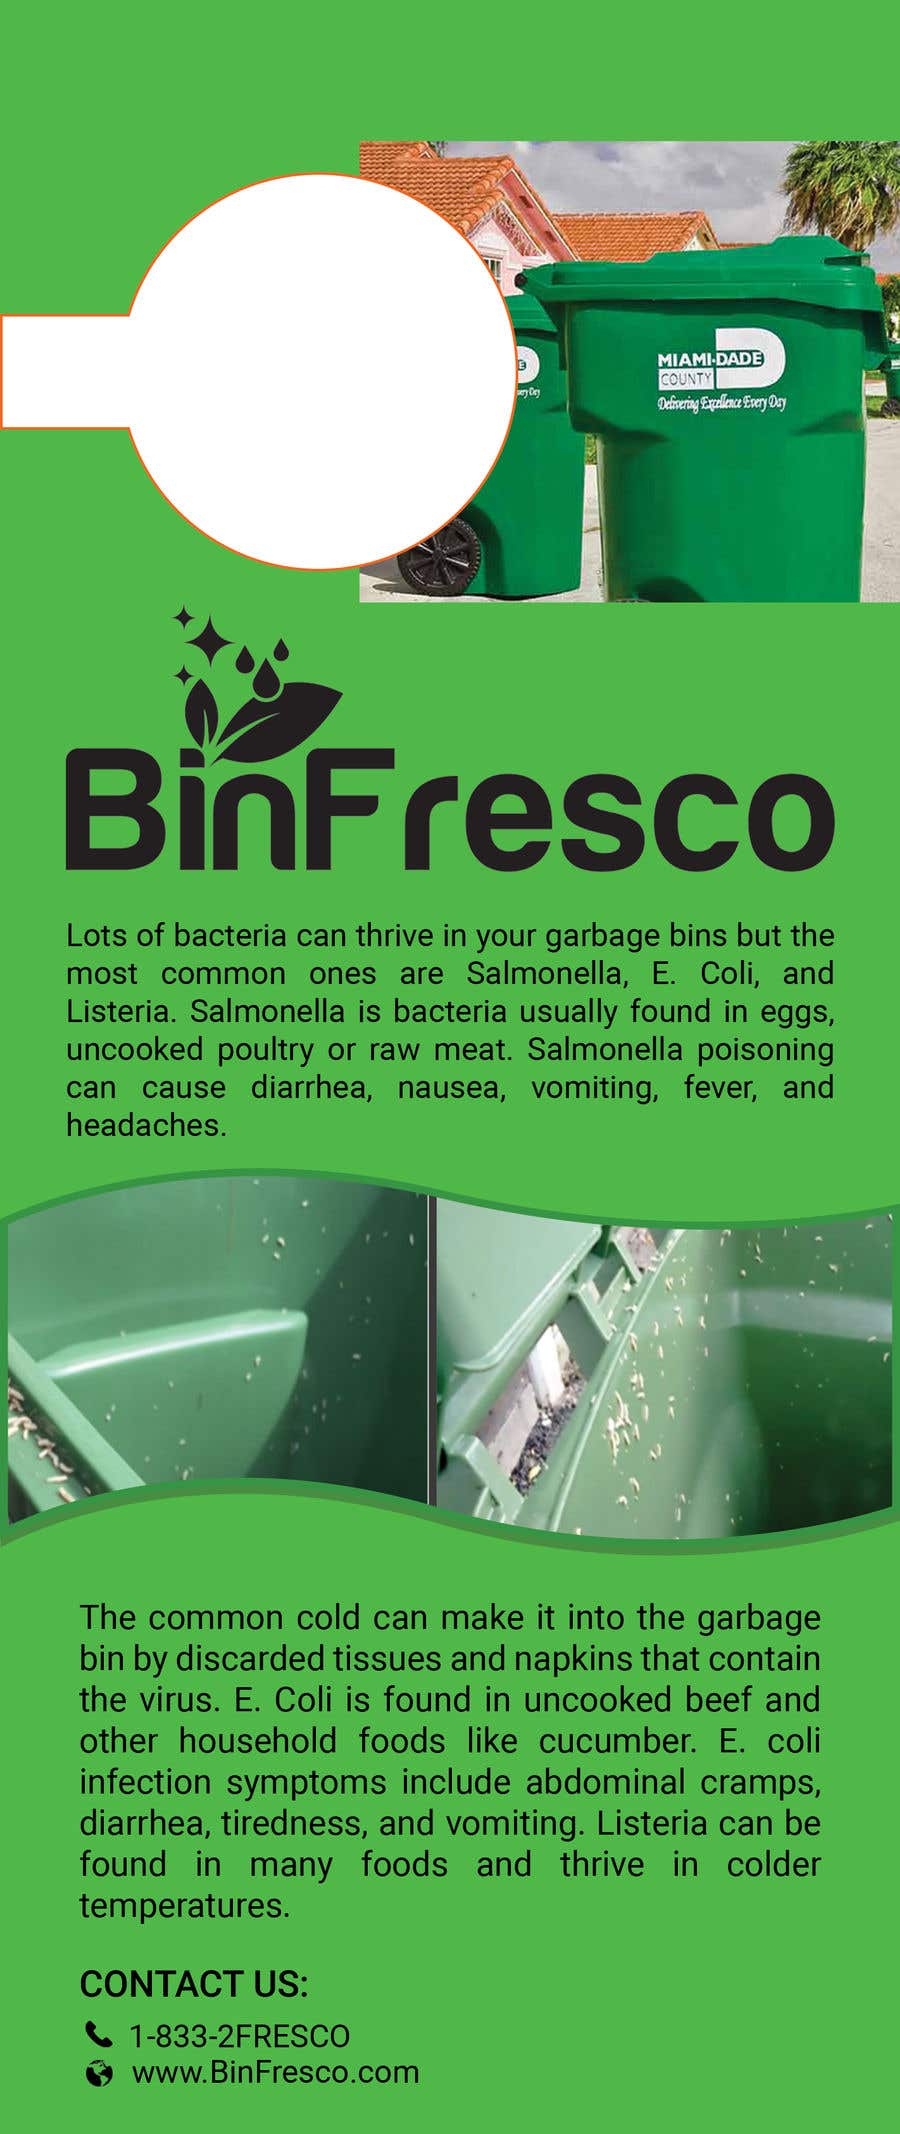 Entry #4 by bhripon990 for BinFresco Door hanger | Freelancer